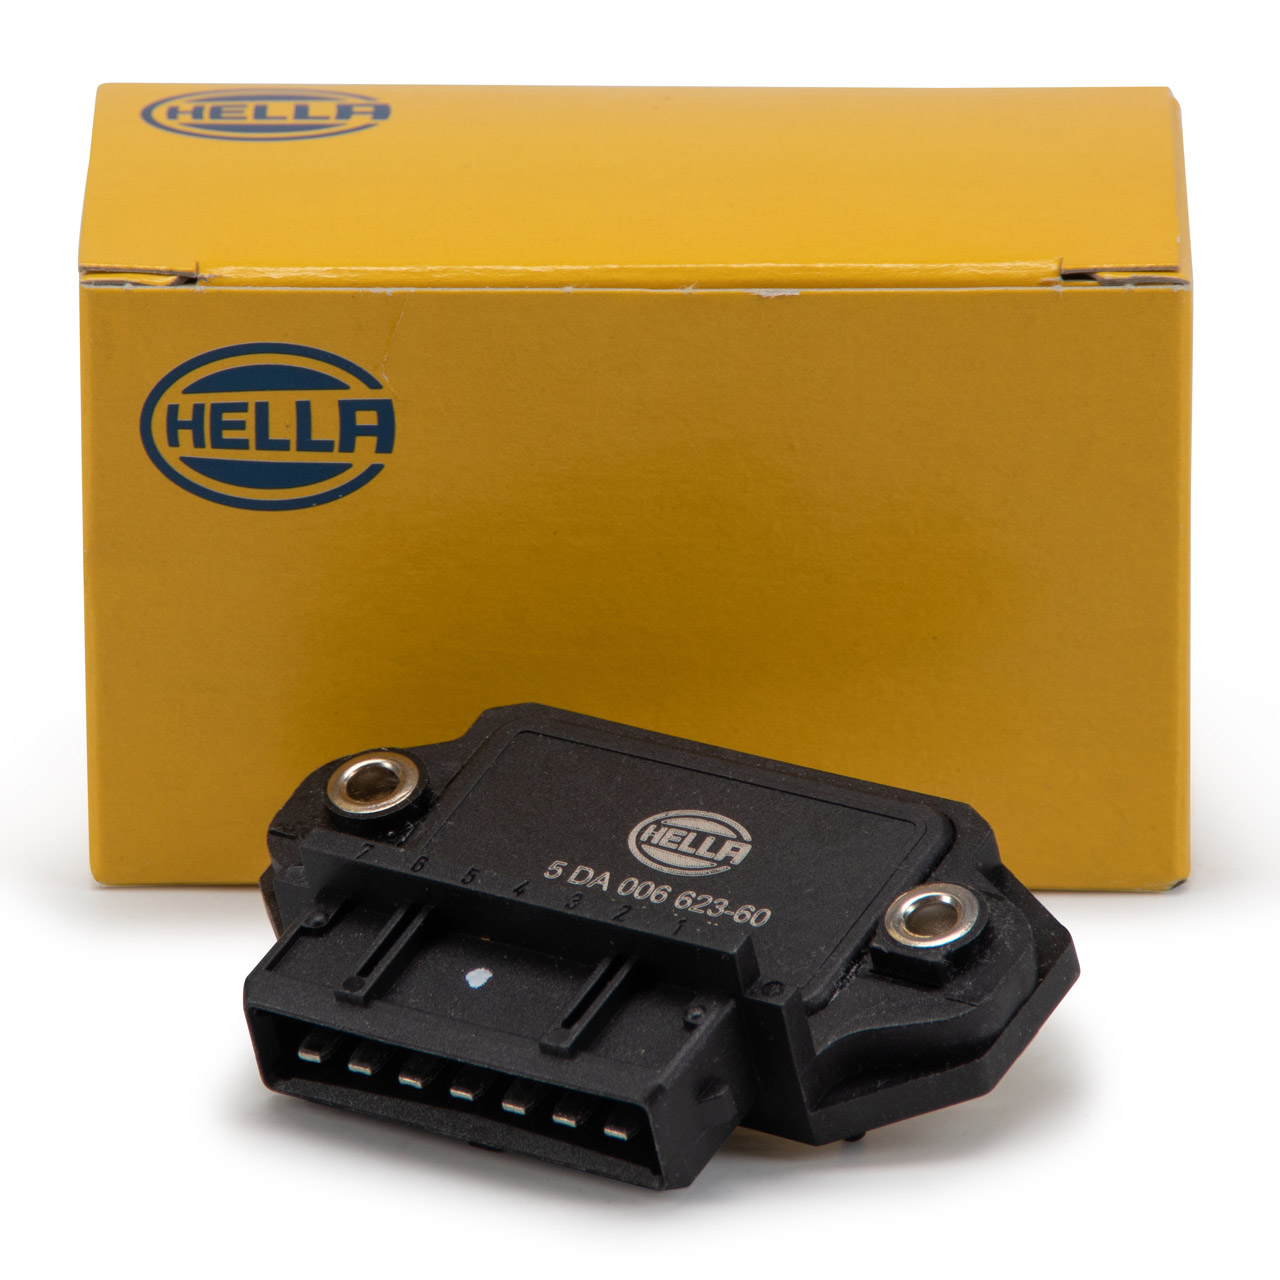 HELLA Schaltgerät Zündanlage PORSCHE 993 3.6/3.8 Carrera OPEL ALFA ROMEO